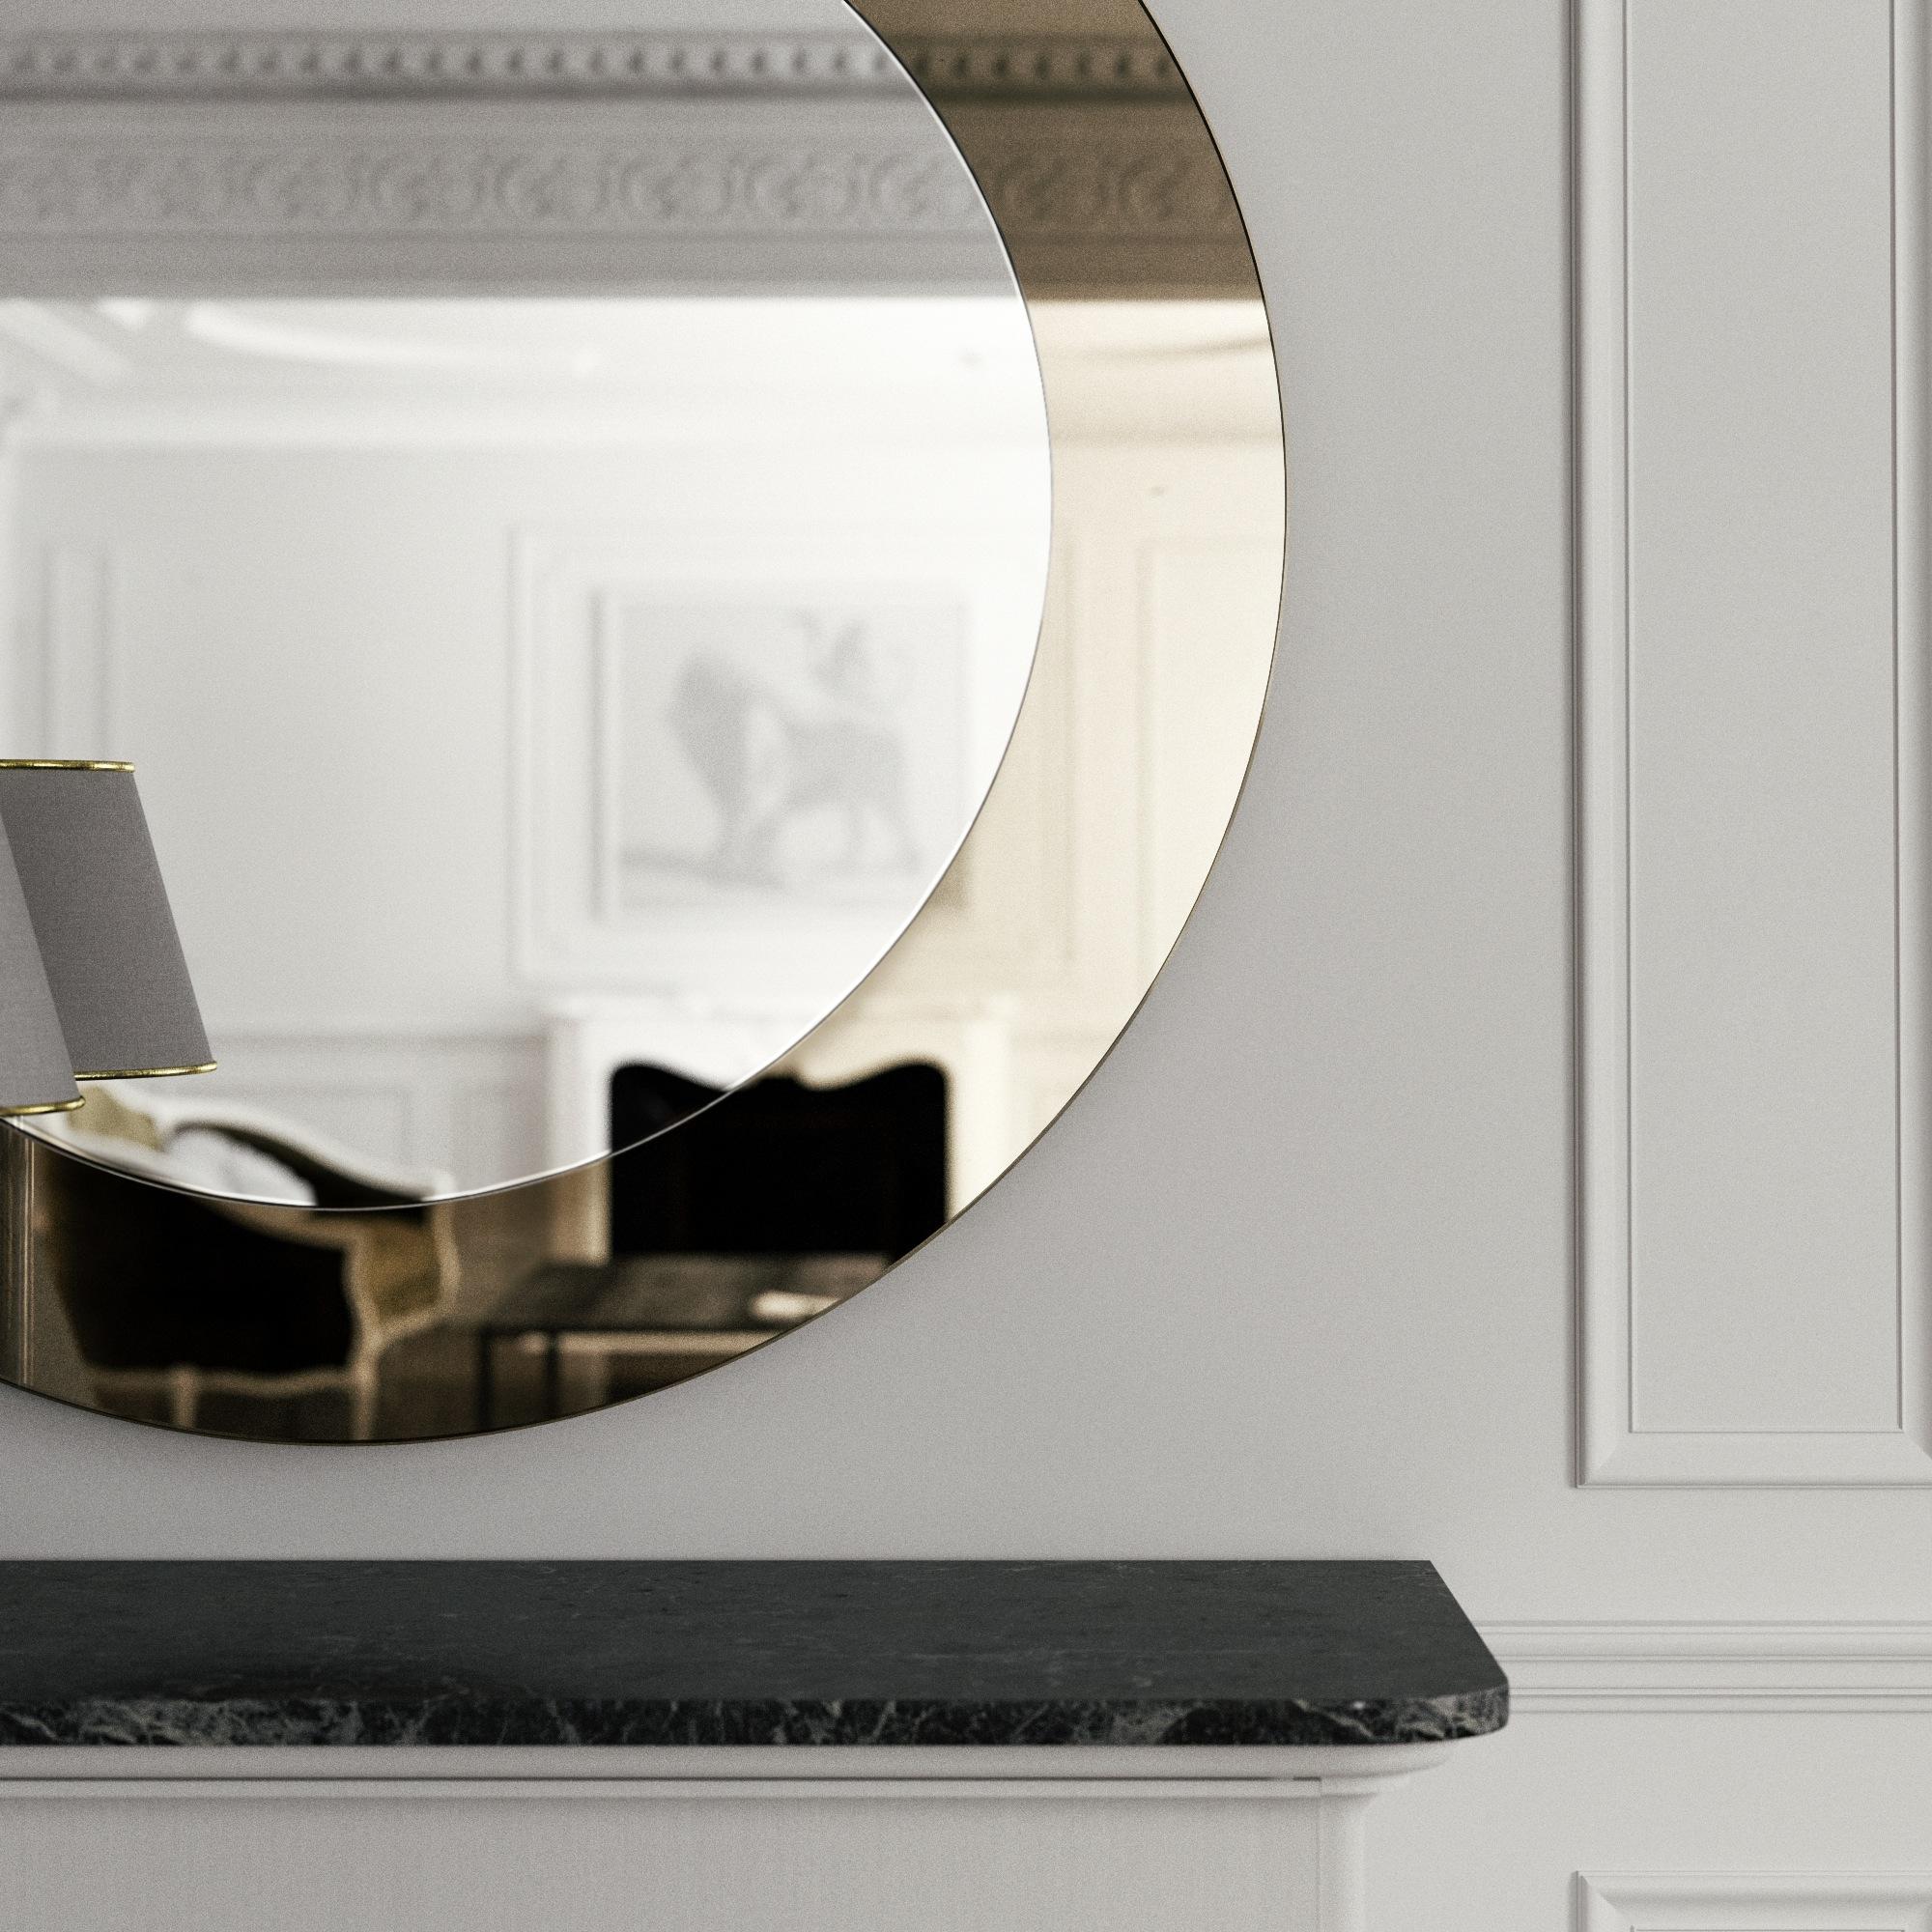 Detailed View of Golden Mirror